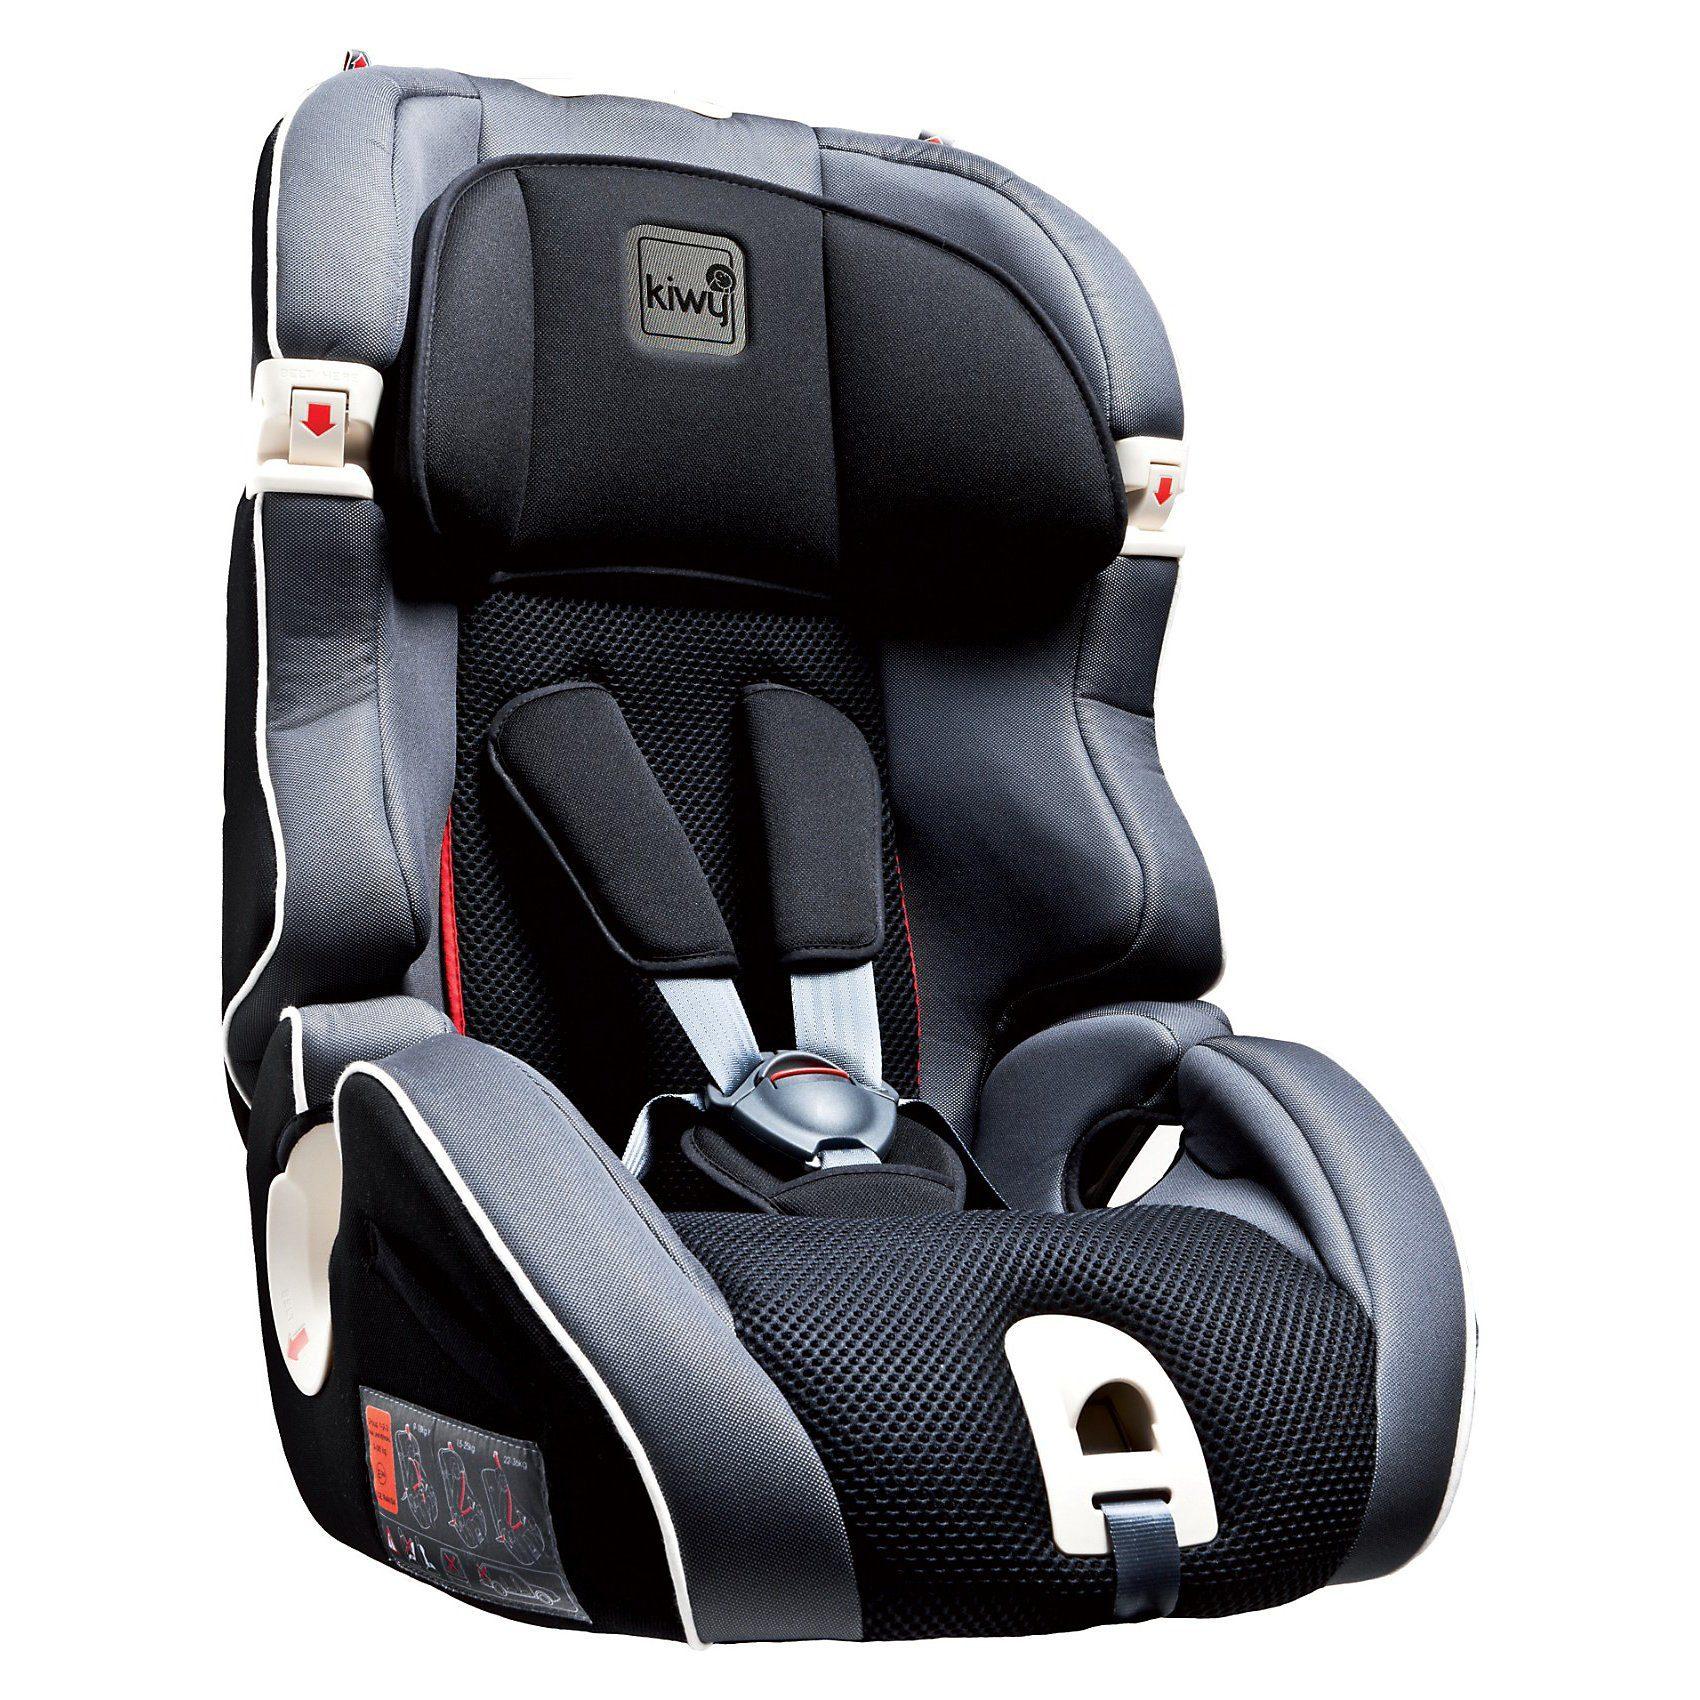 Kiwy Auto-Kindersitz SL123, Carbon, 2016